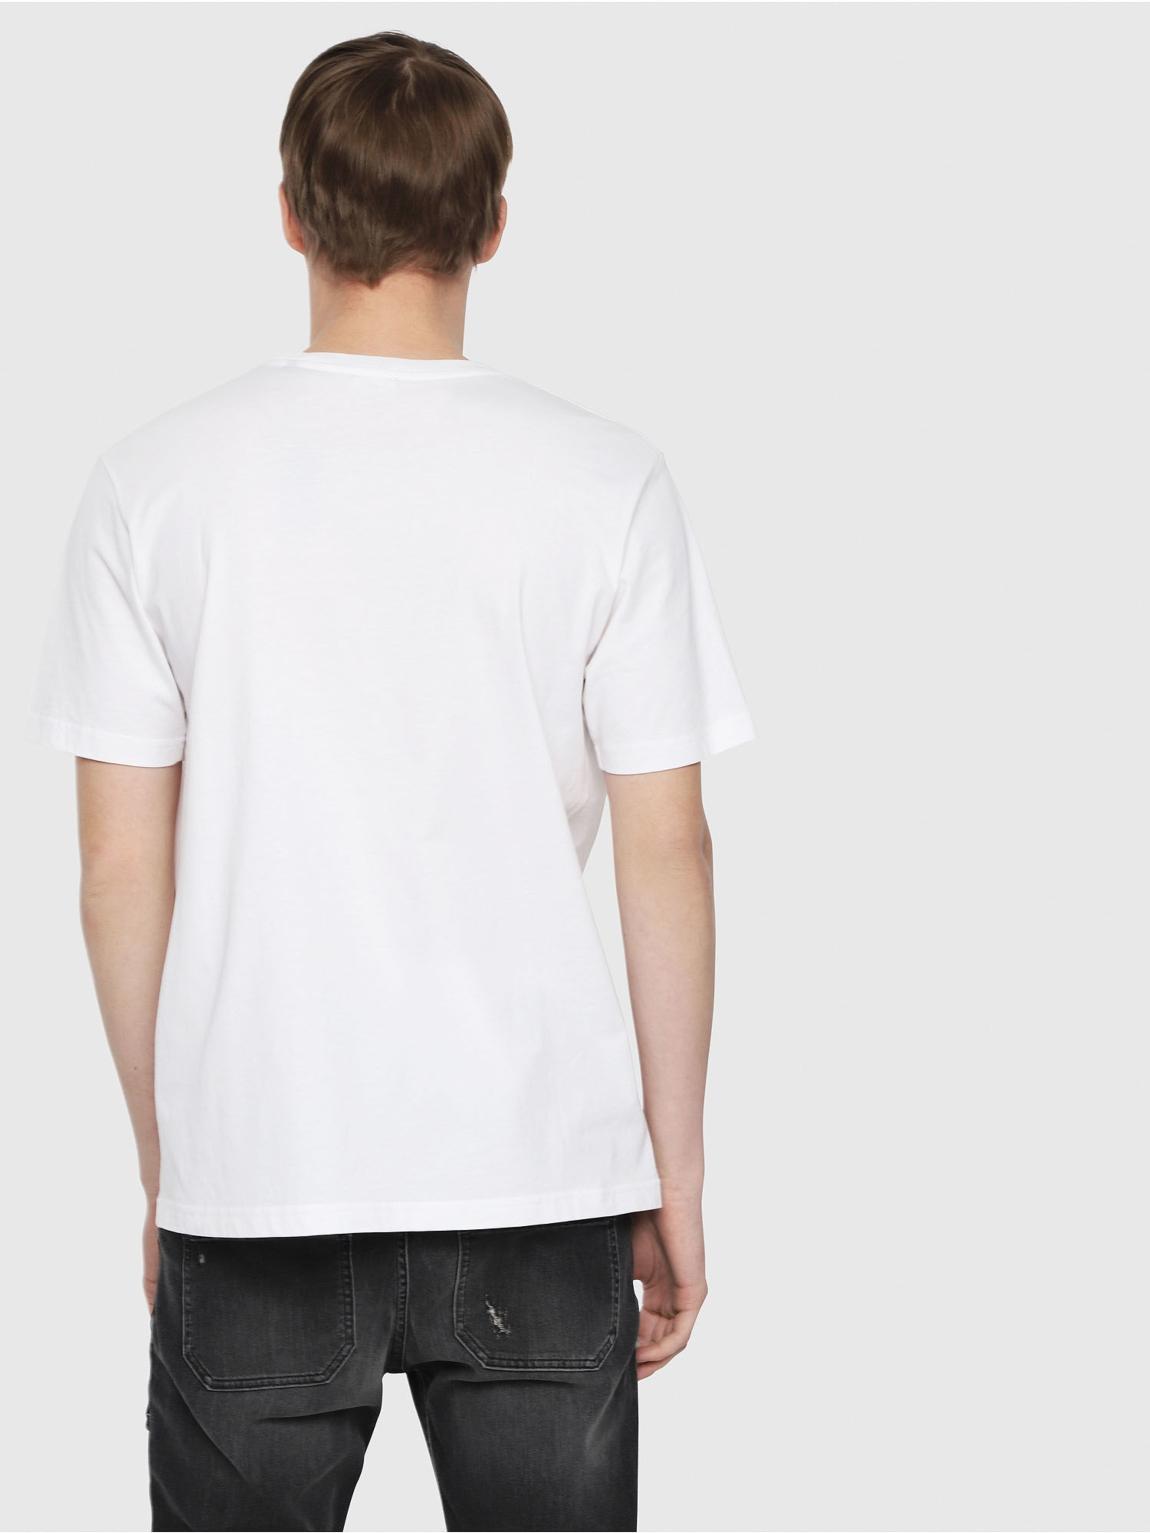 Camiseta DIESEL logo gráfico blanco - Ítem2